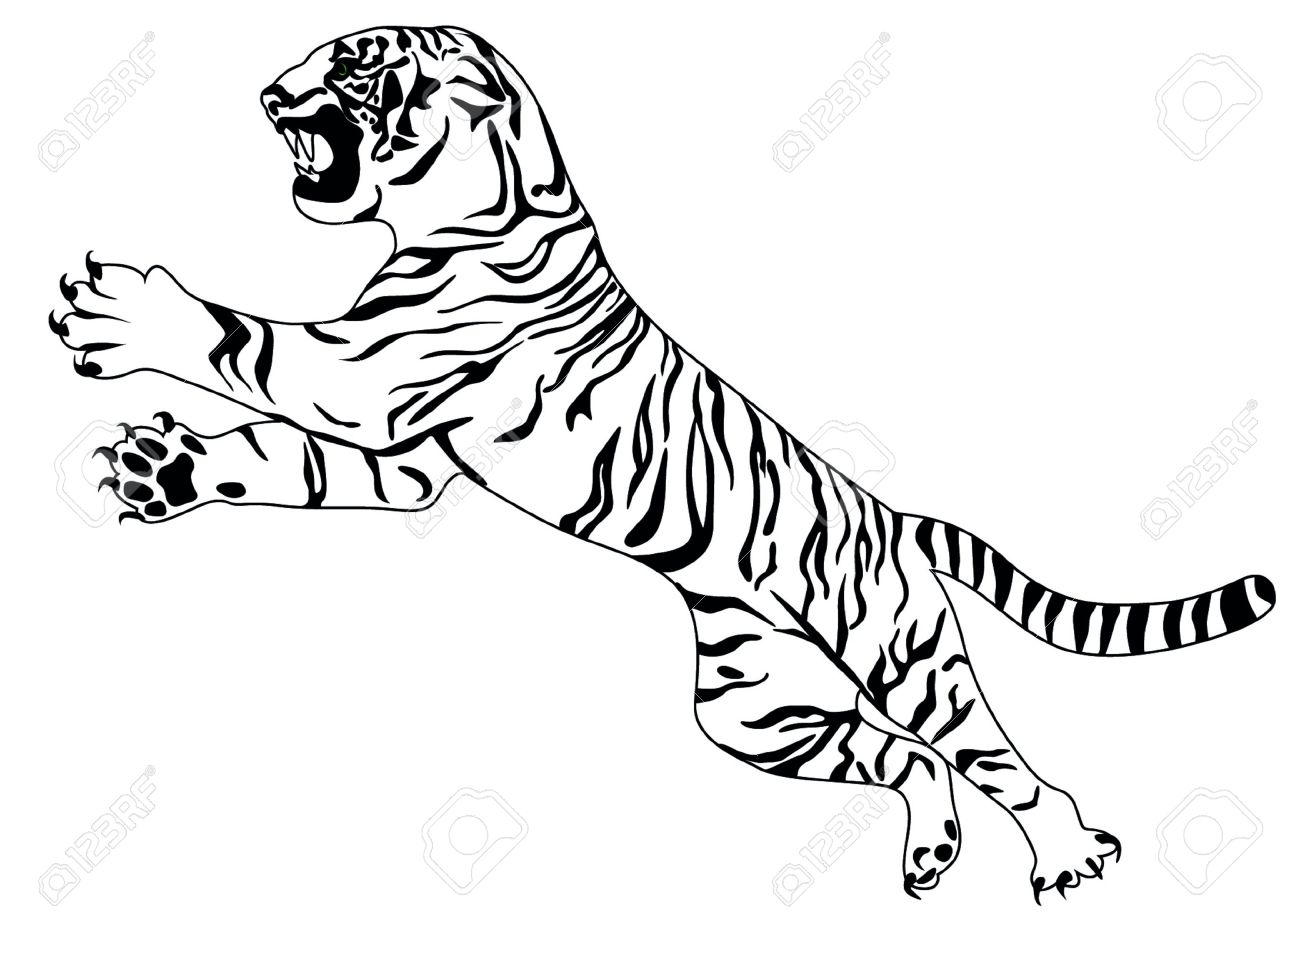 tiger Stock Vector - 11830879